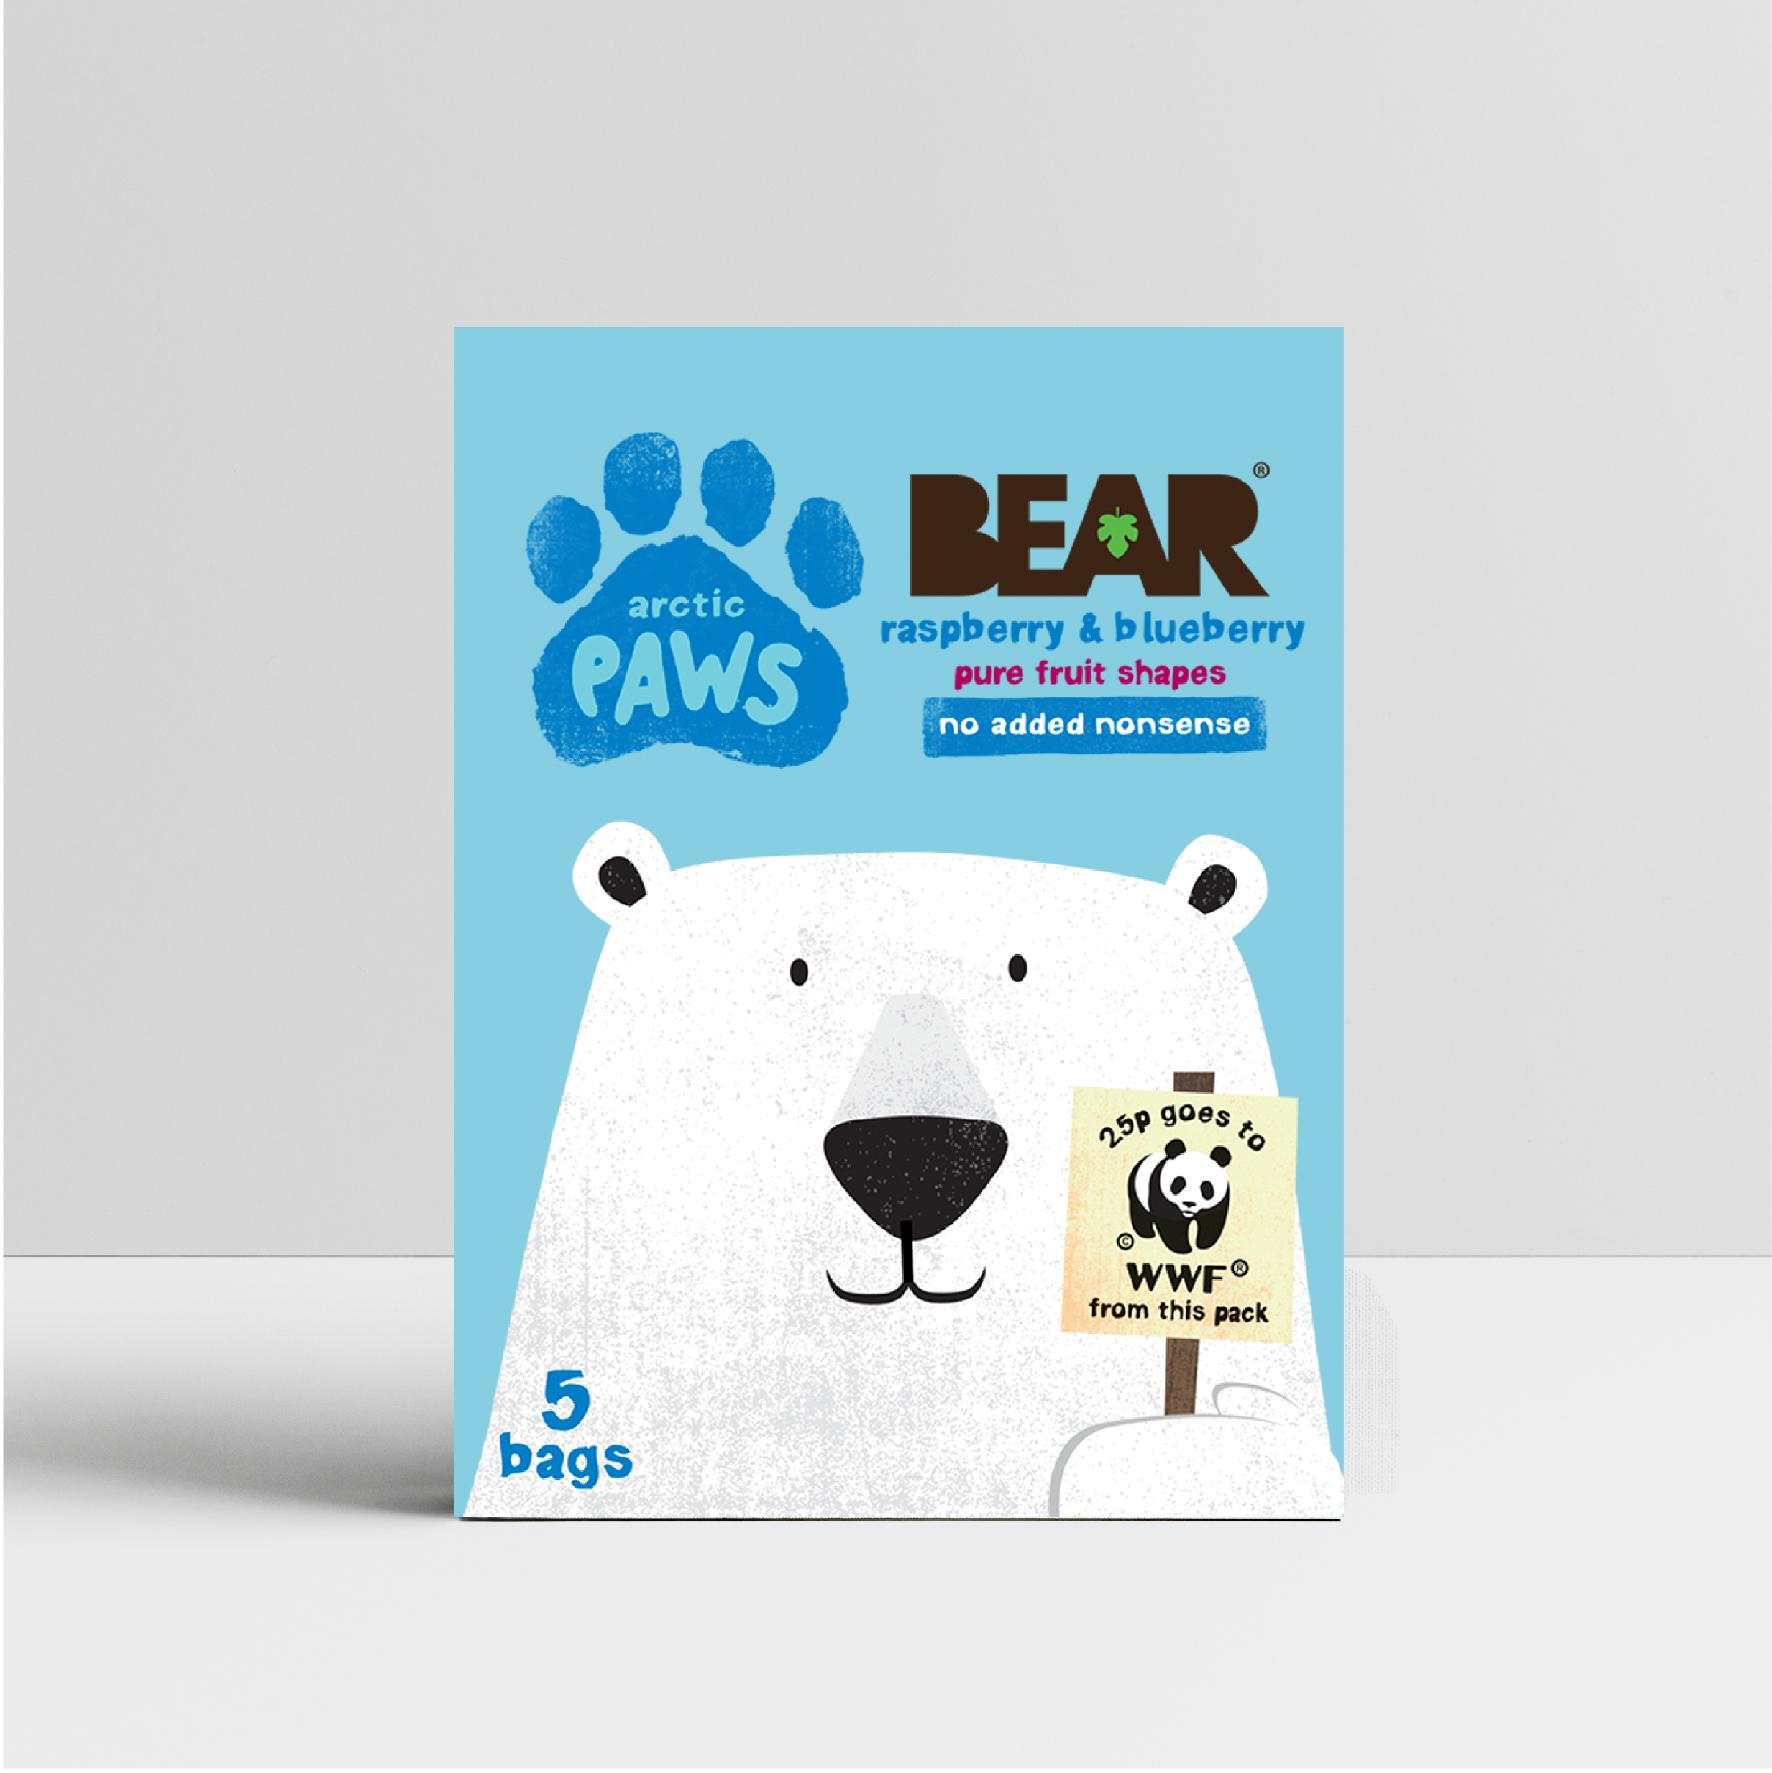 BEAR Paws x WWF Campaign